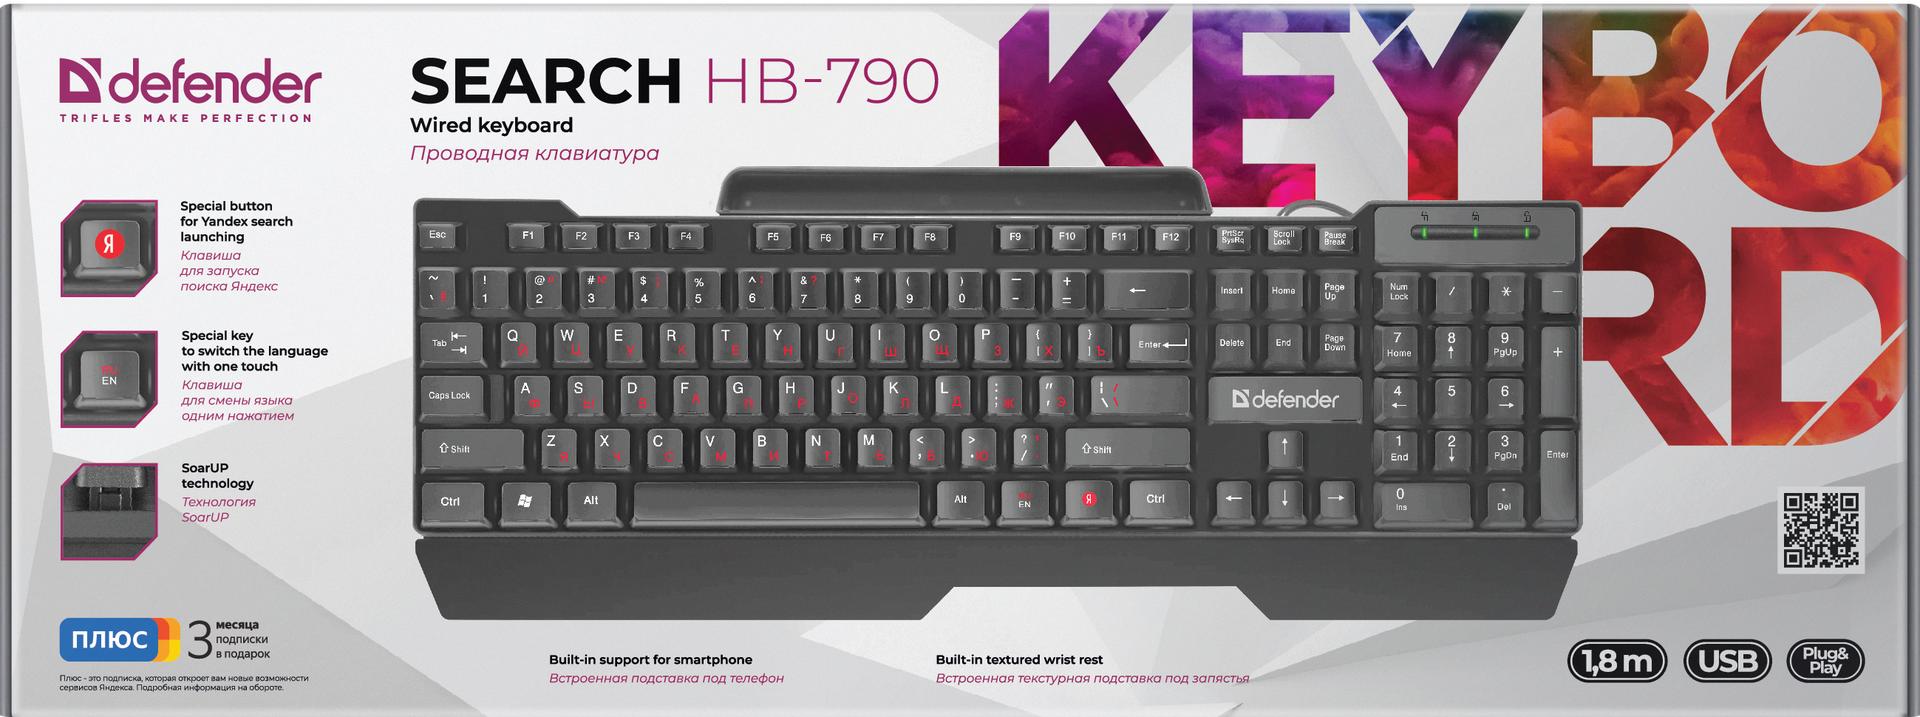 Клавиатура Defender Search HB-790 RU, полноразмерная для PC (черный) (45790)